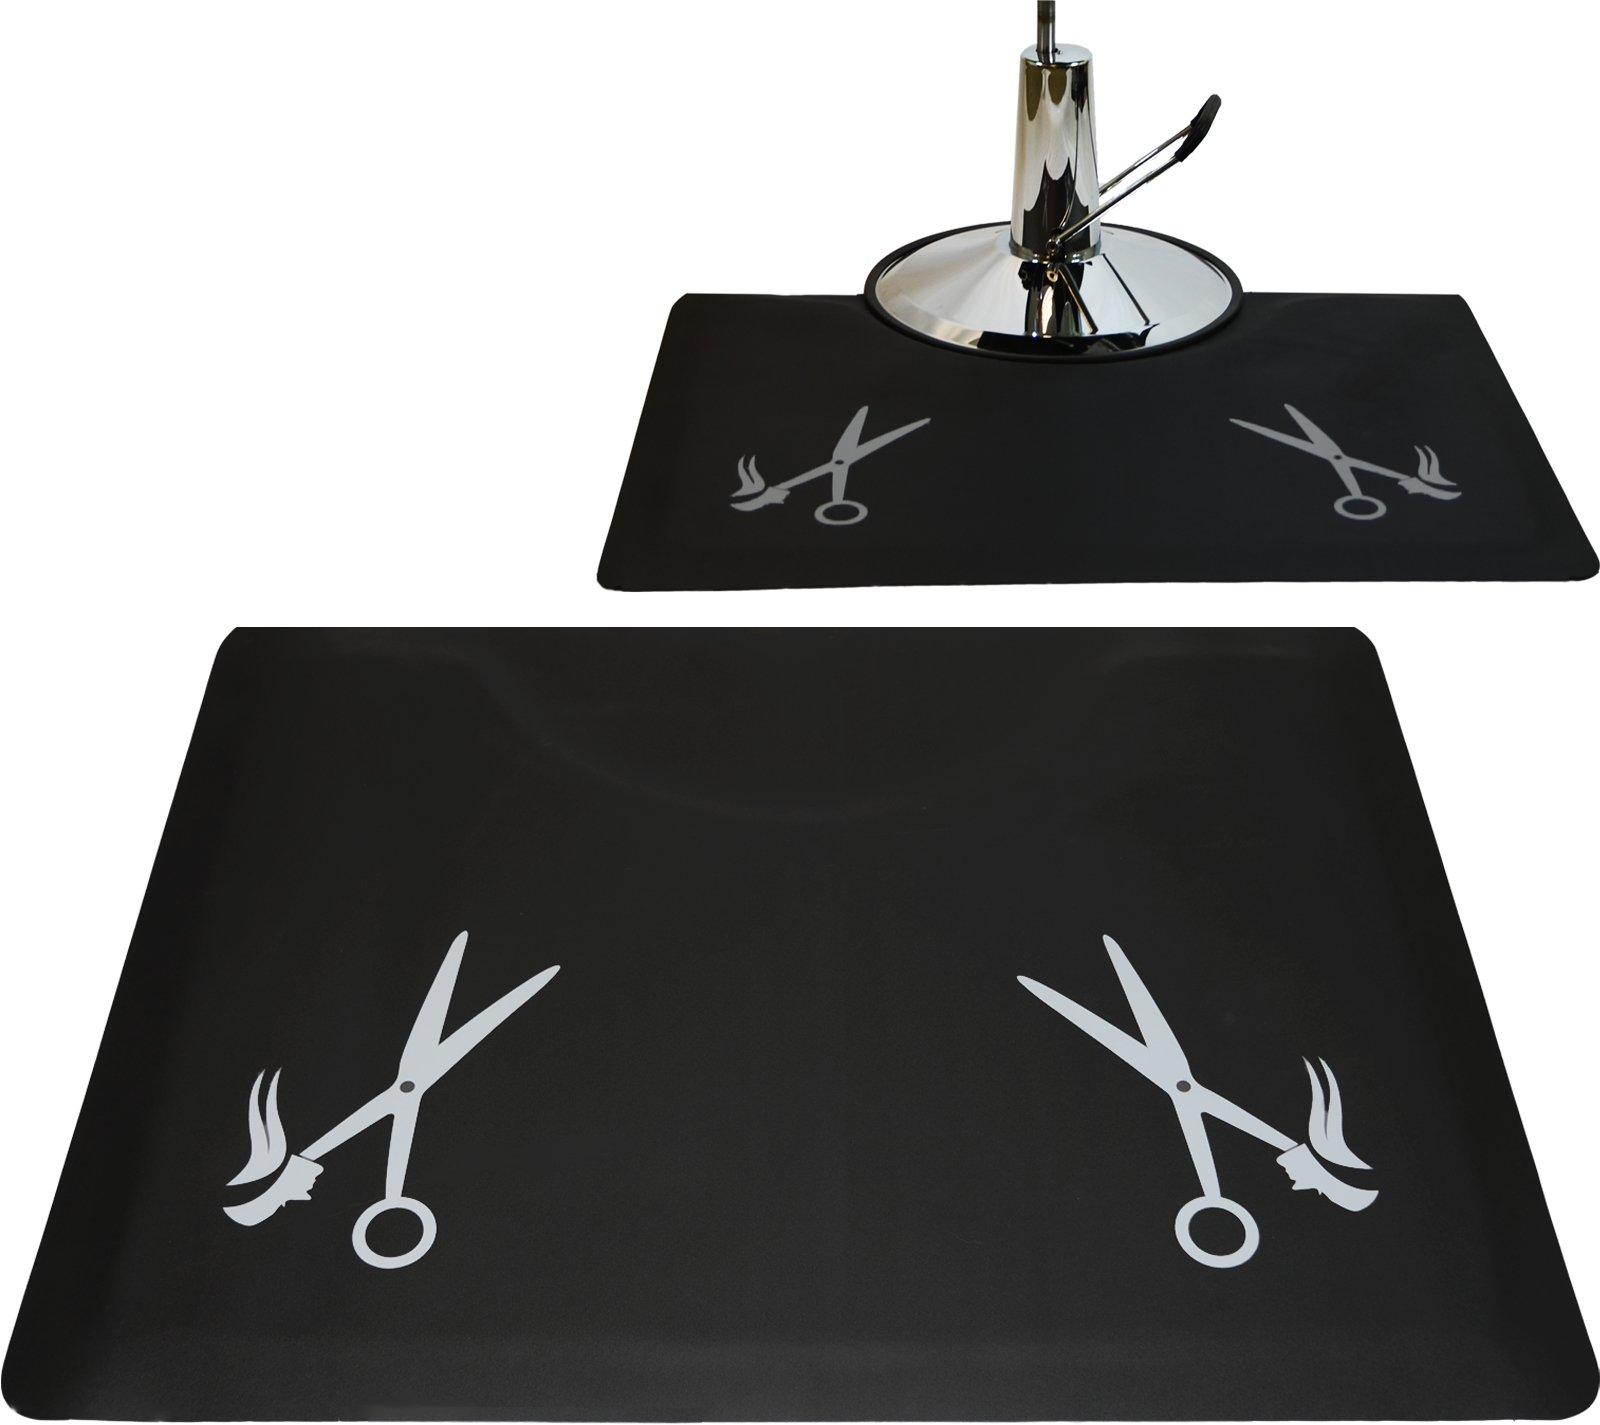 LCL Beauty 1/2'' Rectangle Anti Fatigue Beauty Barber Floor Mat with Grey Salon Scissor Design